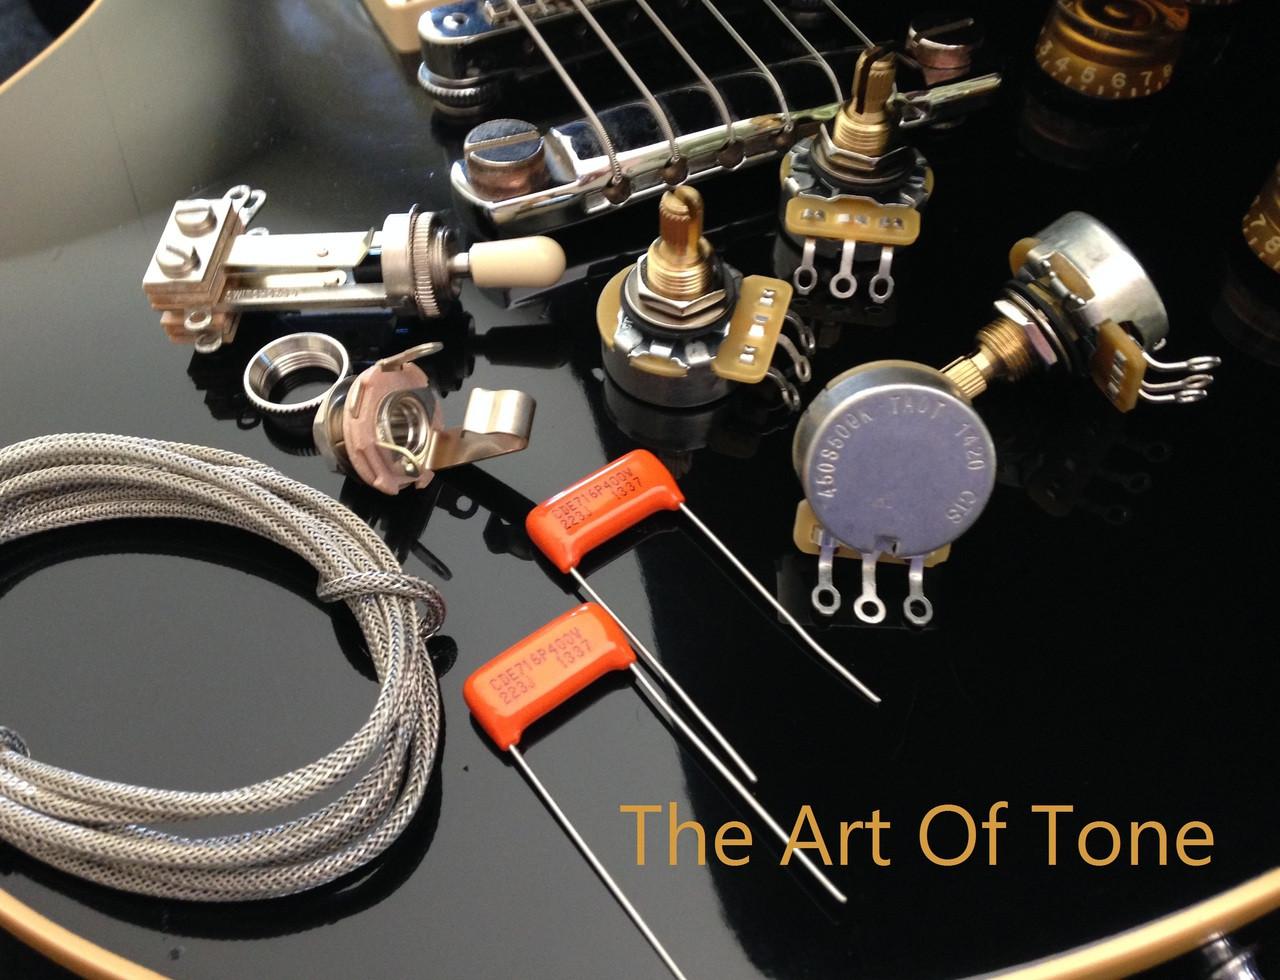 TAOT Gibson Les Paul Wiring Kit - Short Shaft - Orange Drop Caps The Art Of